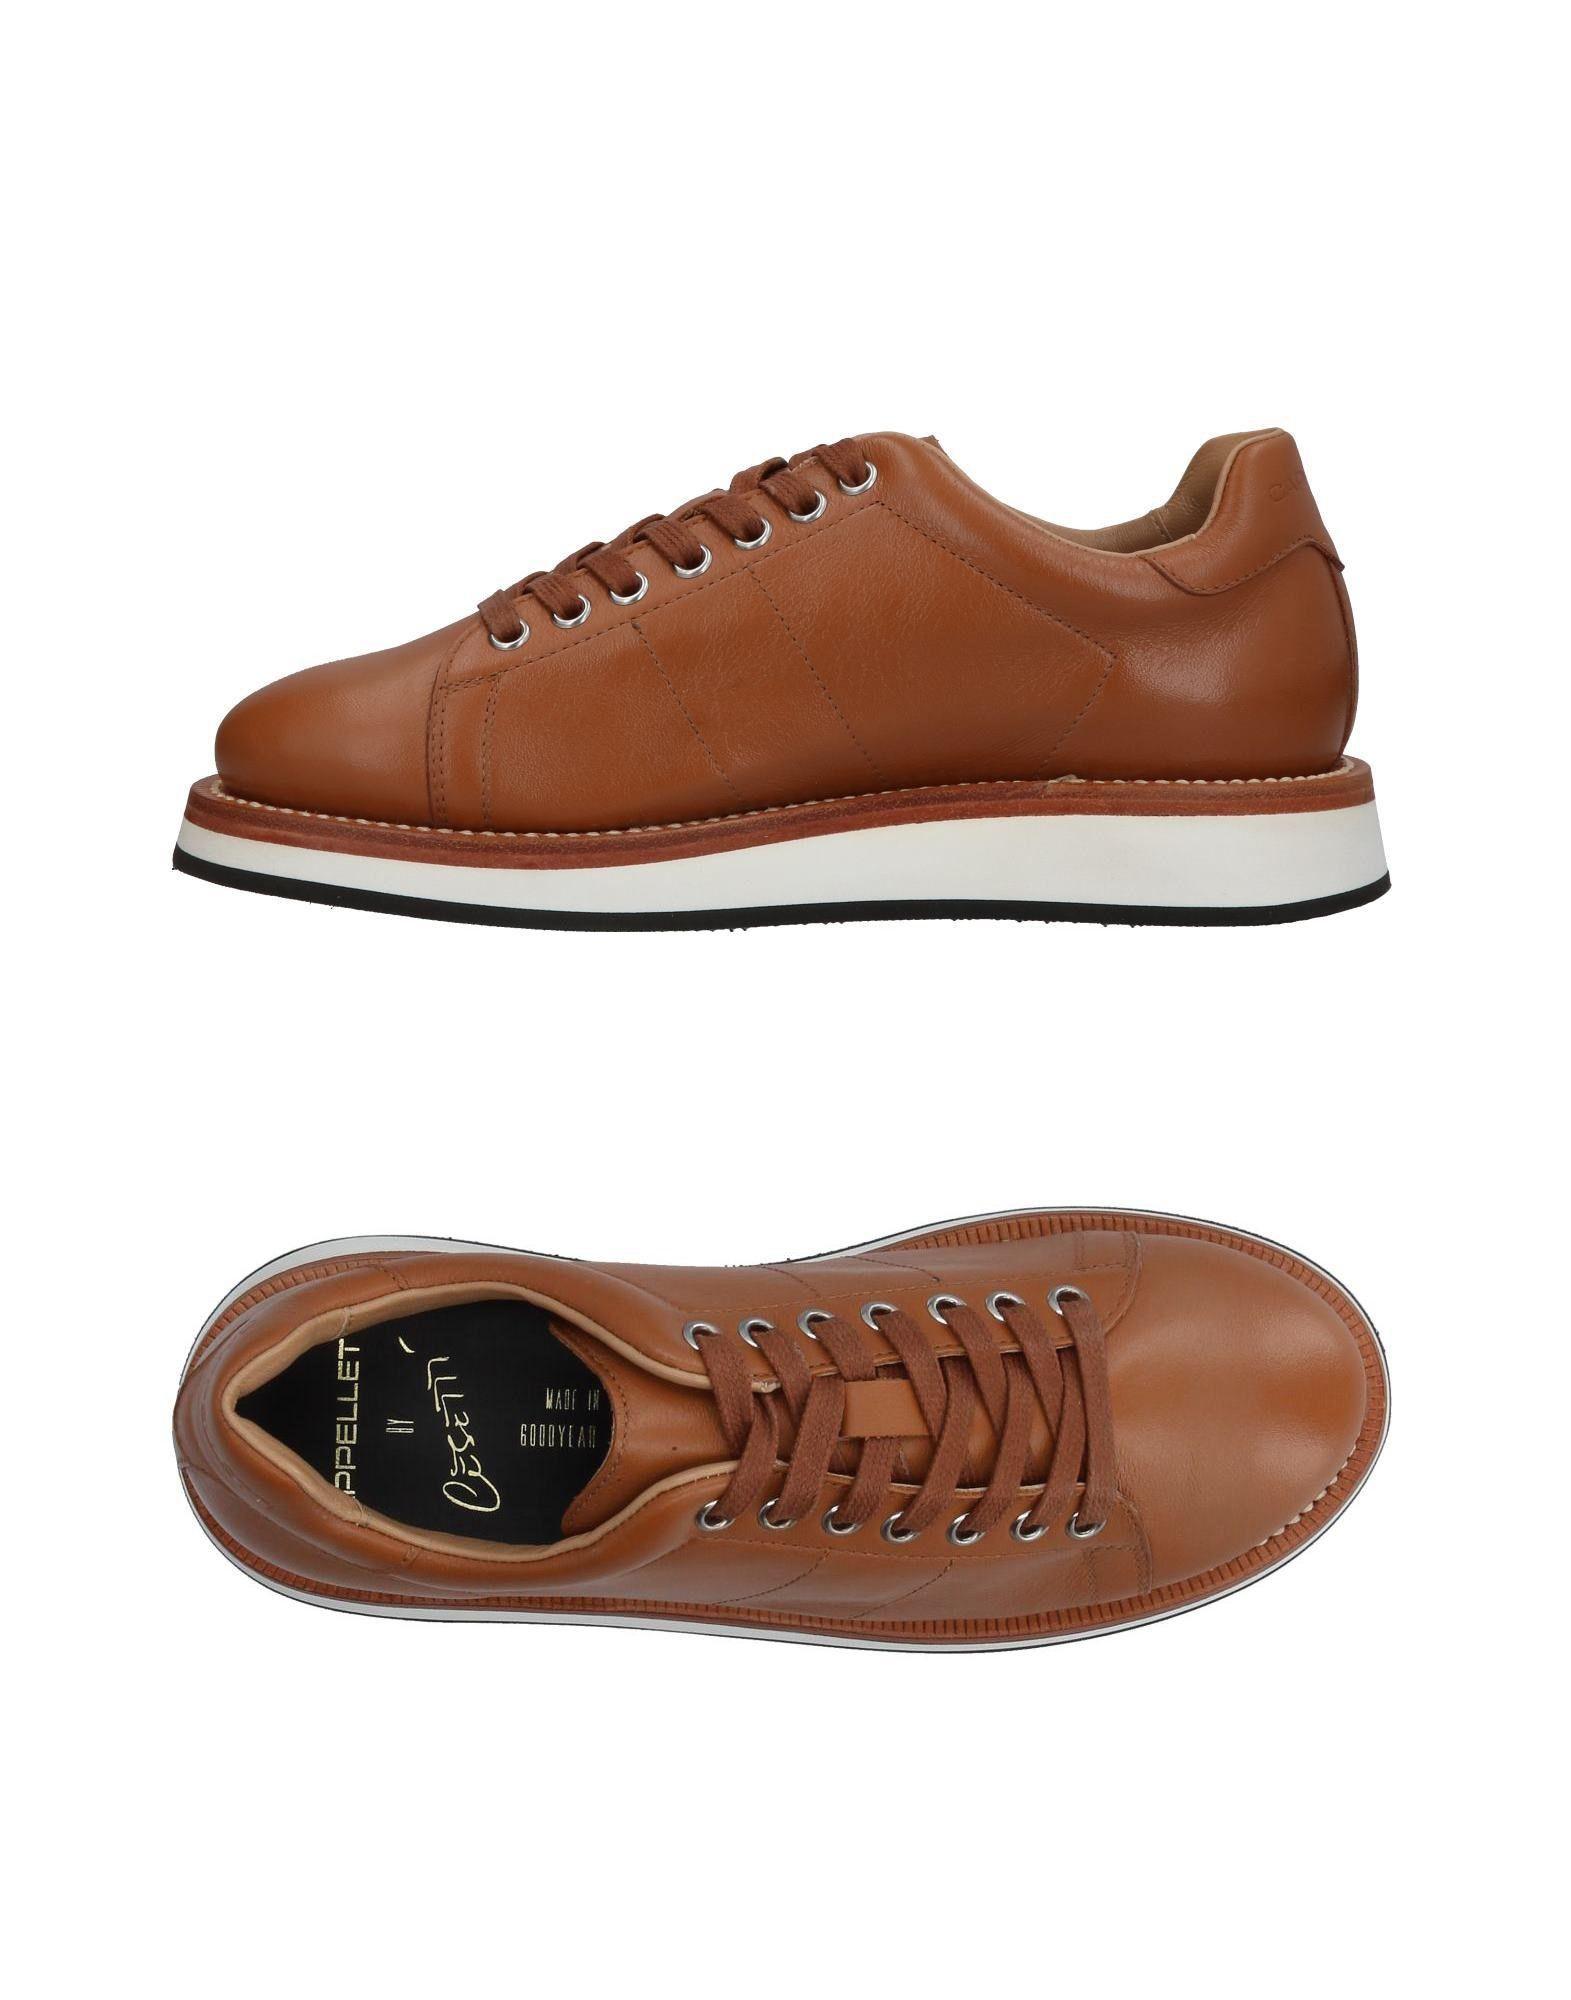 Фото - CAPPELLETTI Обувь на шнурках обувь на высокой платформе dkny